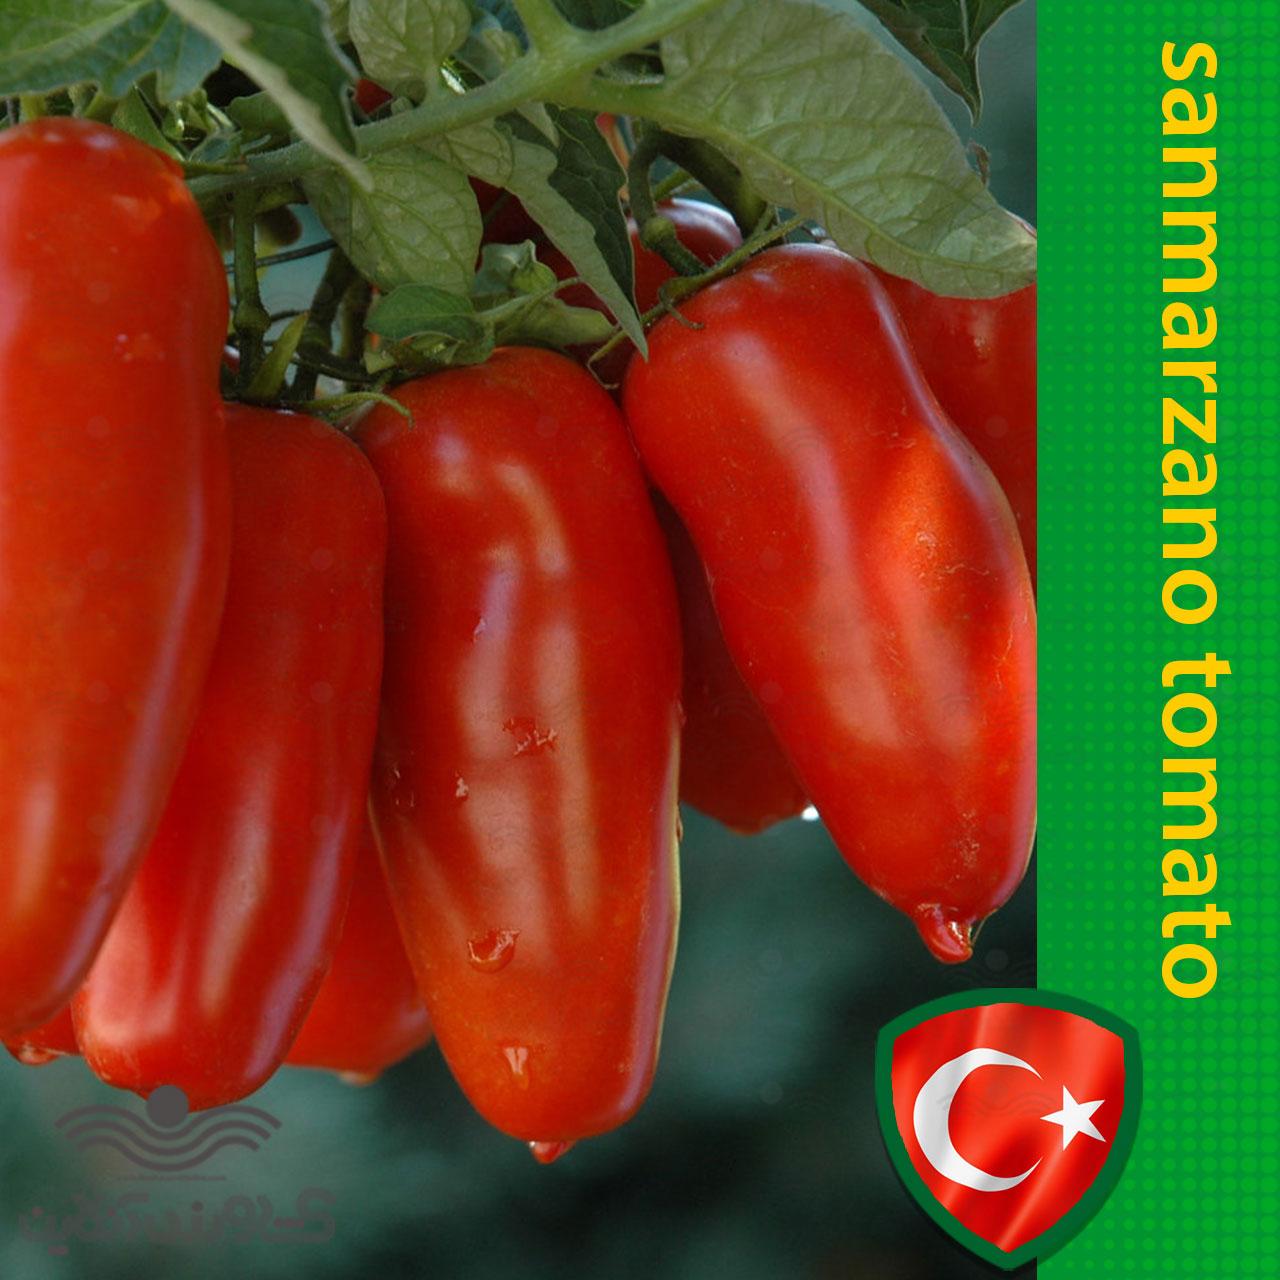 بذر گوجه فرنگی سن مارزانو ترک